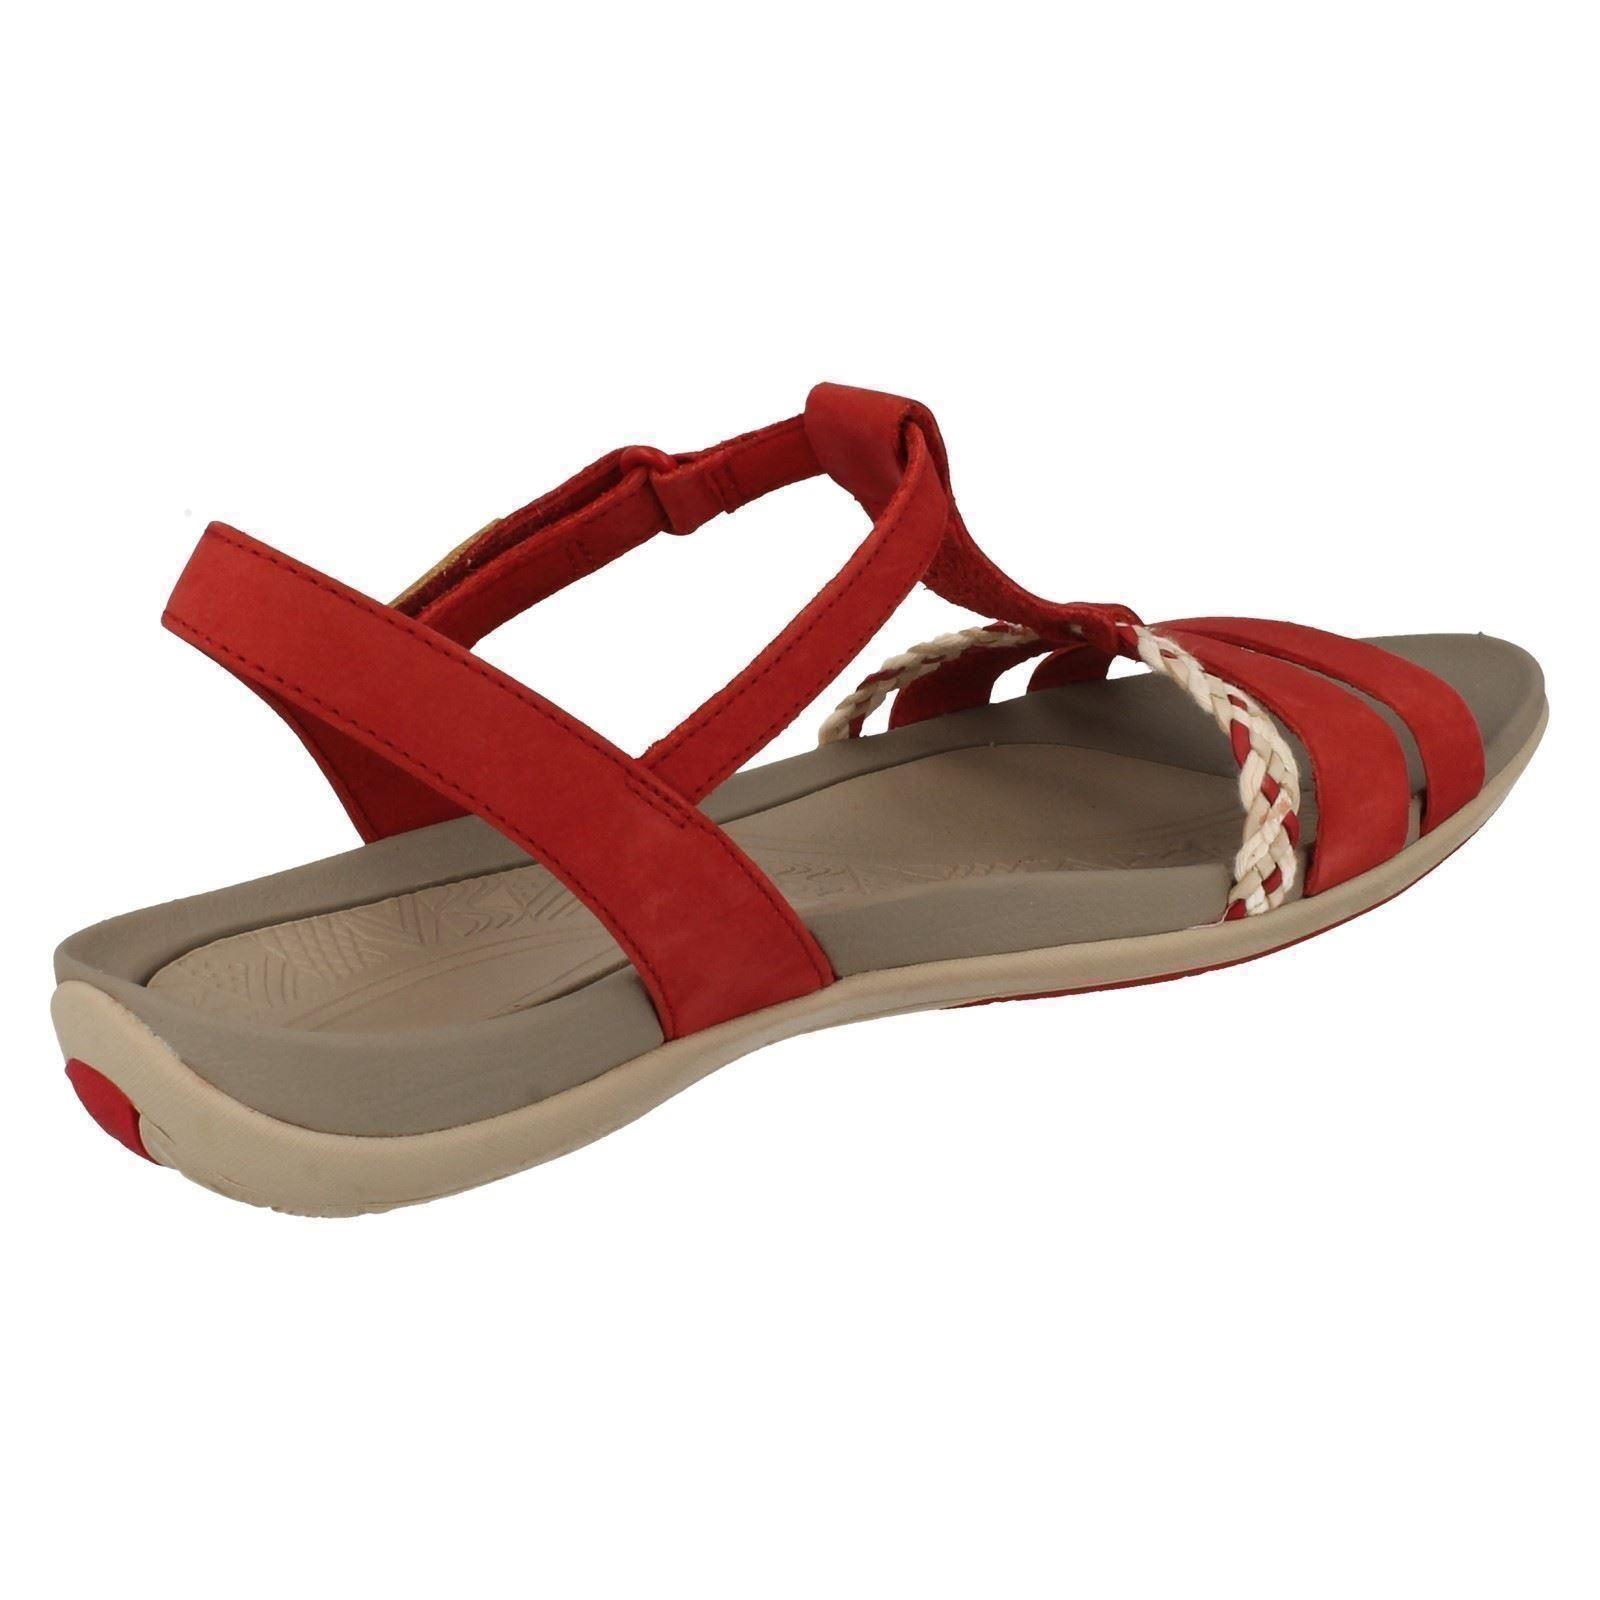 586e1c5016f Ladies-Clarks-Casual-Summer-Sandals-Tealite-Grace thumbnail 14